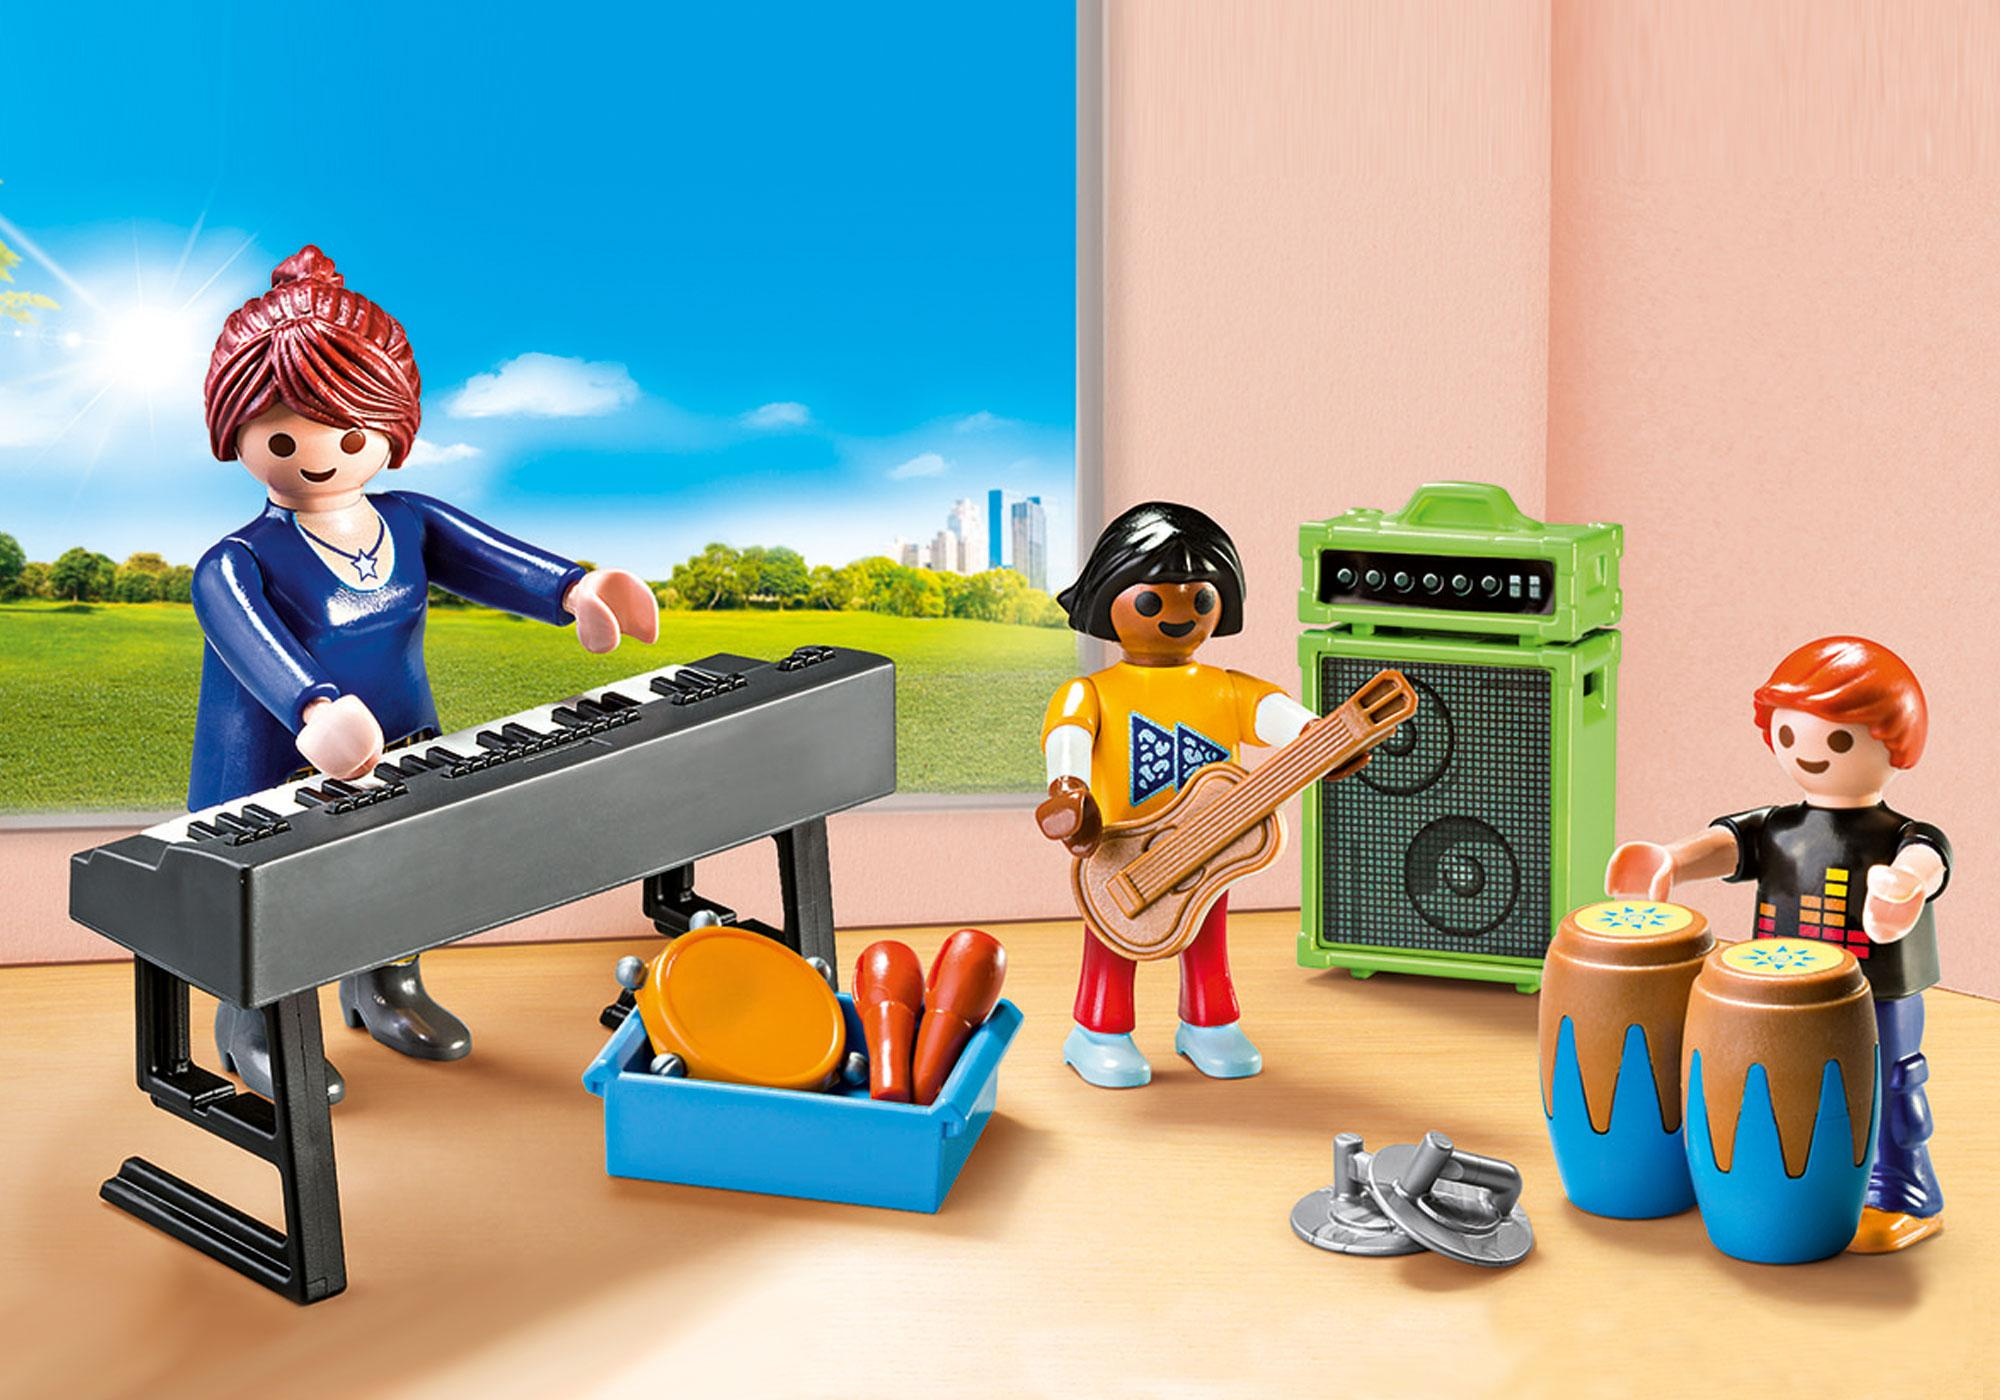 http://media.playmobil.com/i/playmobil/9321_product_detail/Valisette Cours de musique